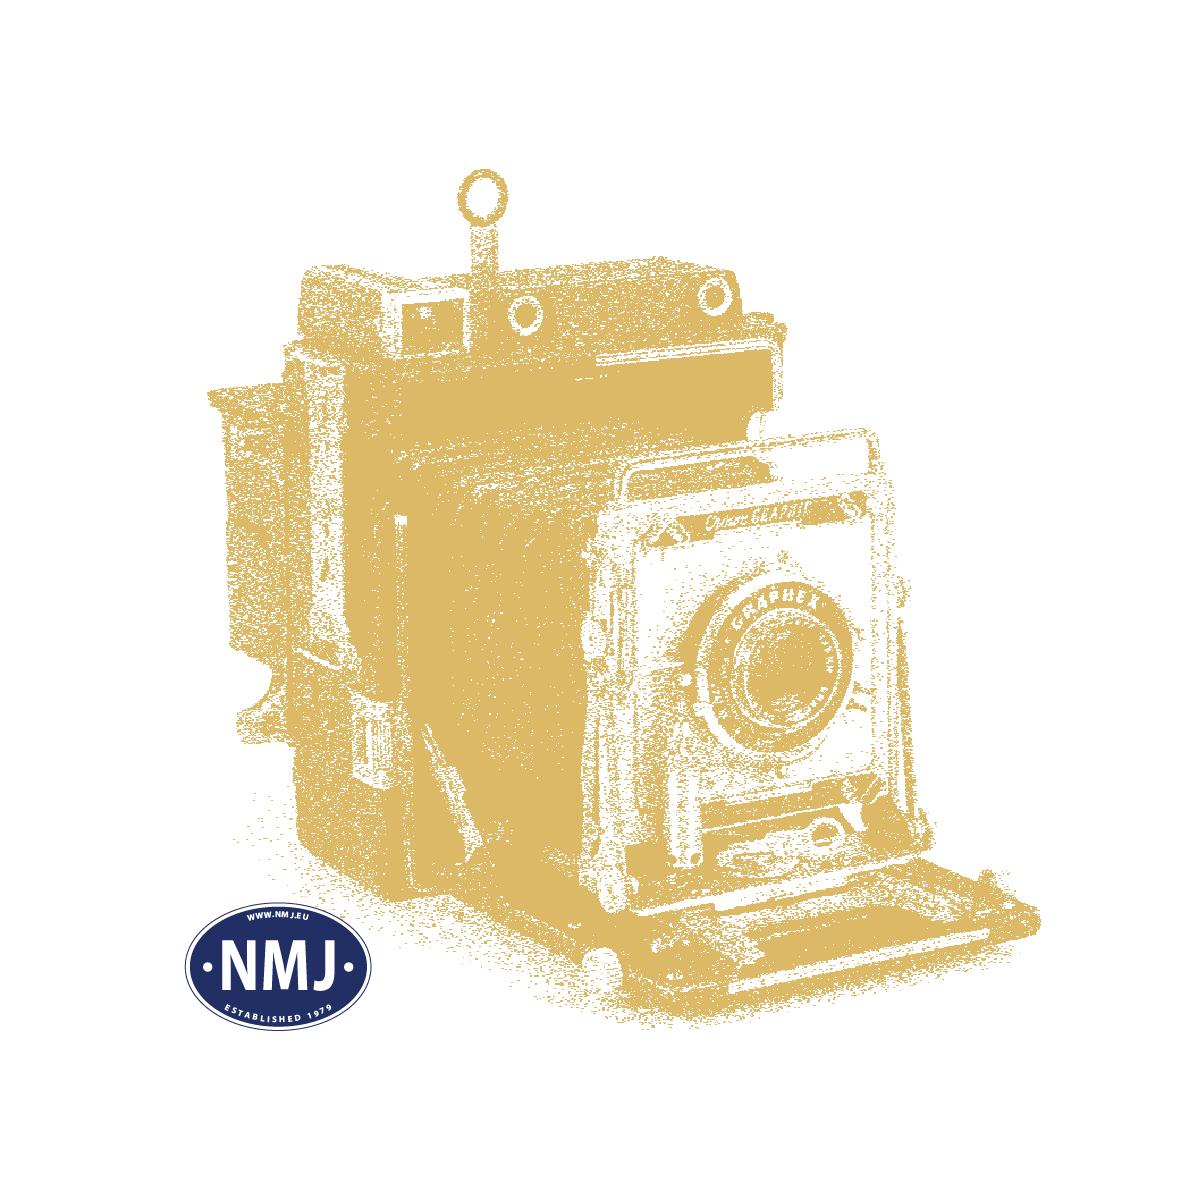 NMJT122.302 - NMJ Topline NSB B7-4 27021